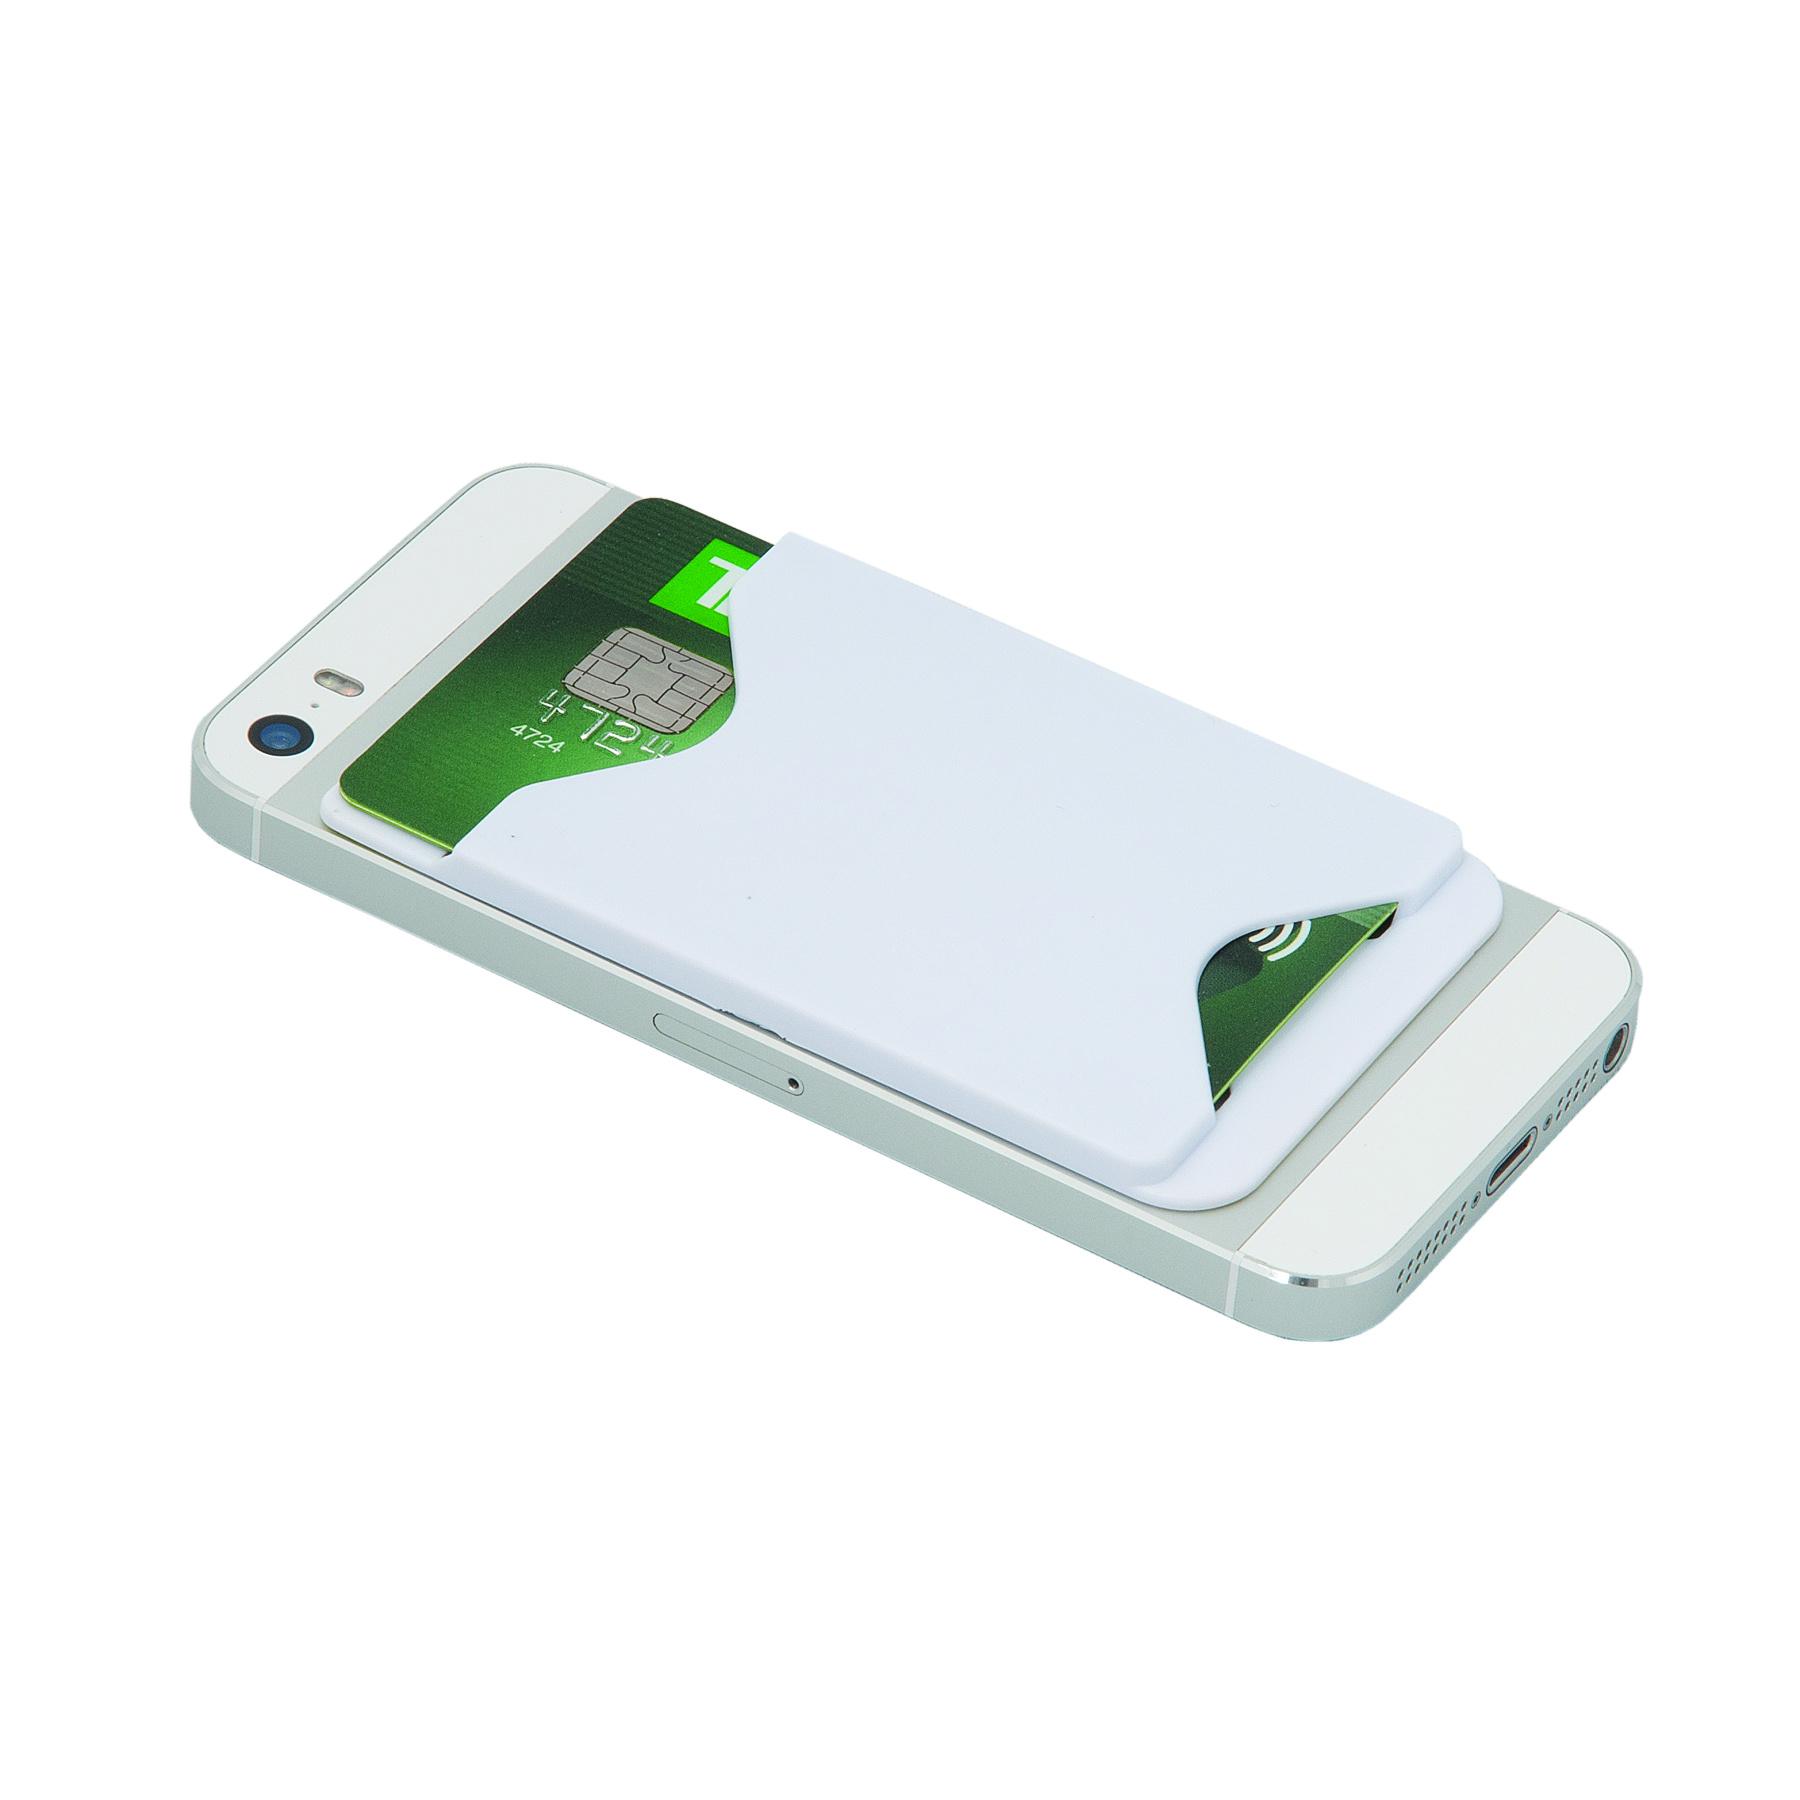 CU6386 DYNO PLASTIC CARD HOLDER Debco Innovation Starts Here